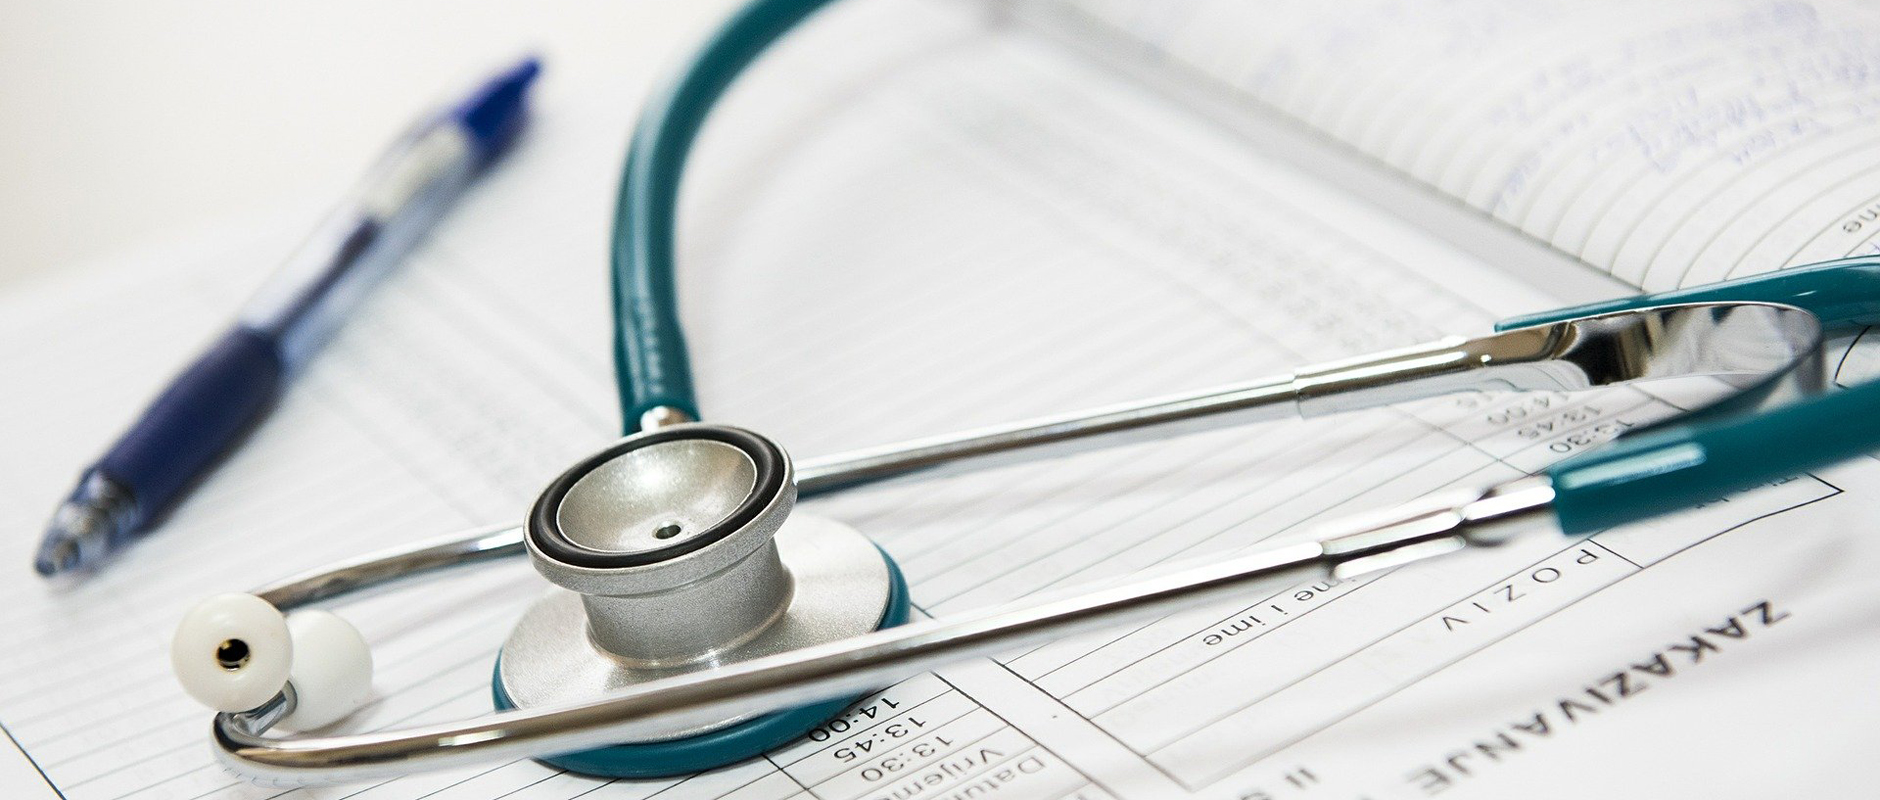 Chirurgie orthopédique - Traumatologie